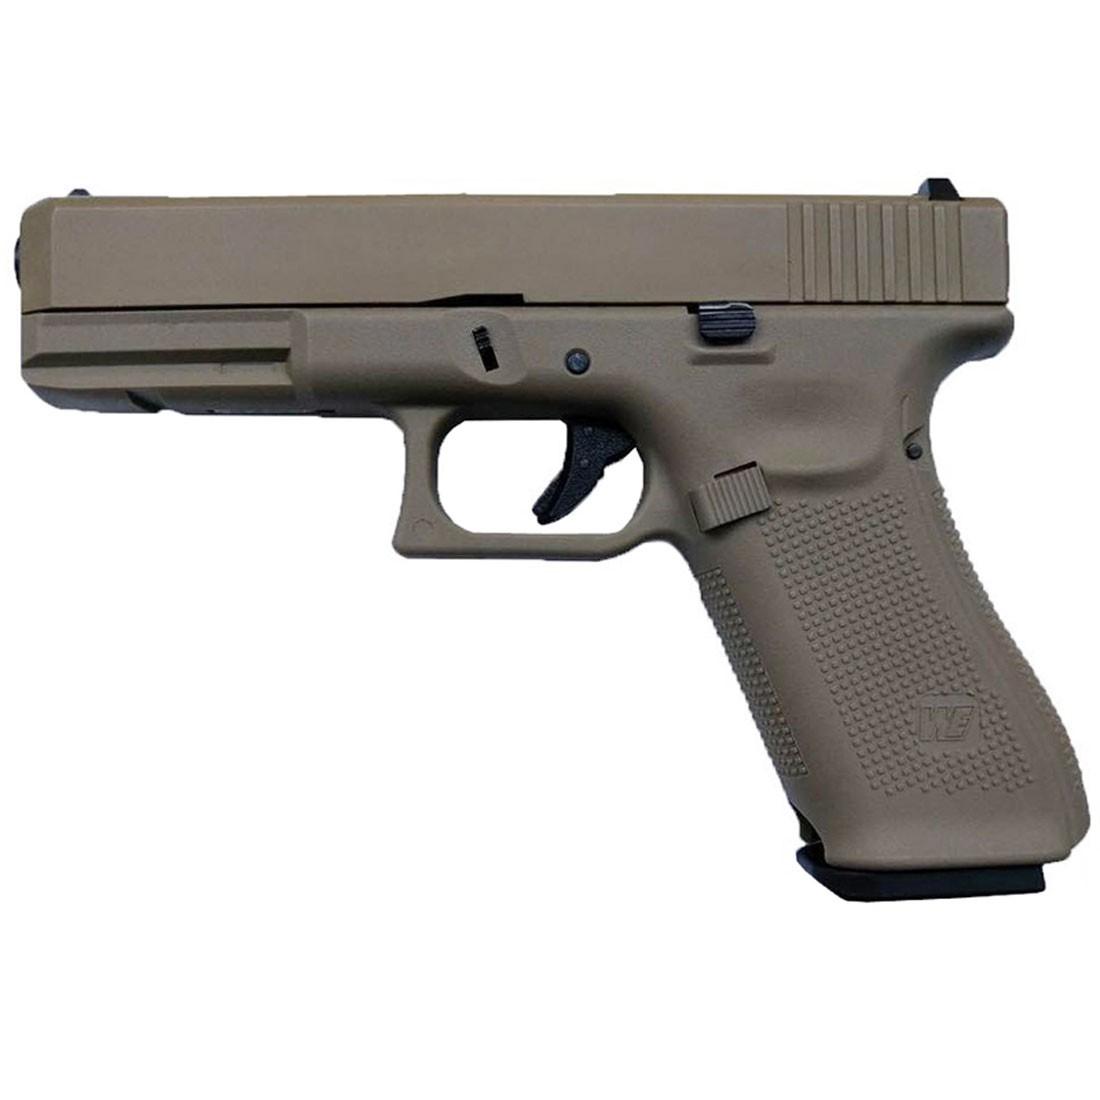 WE EU G17 Gen 5 GBB Airsoft Pistol (Tan) - PRE-ORDER